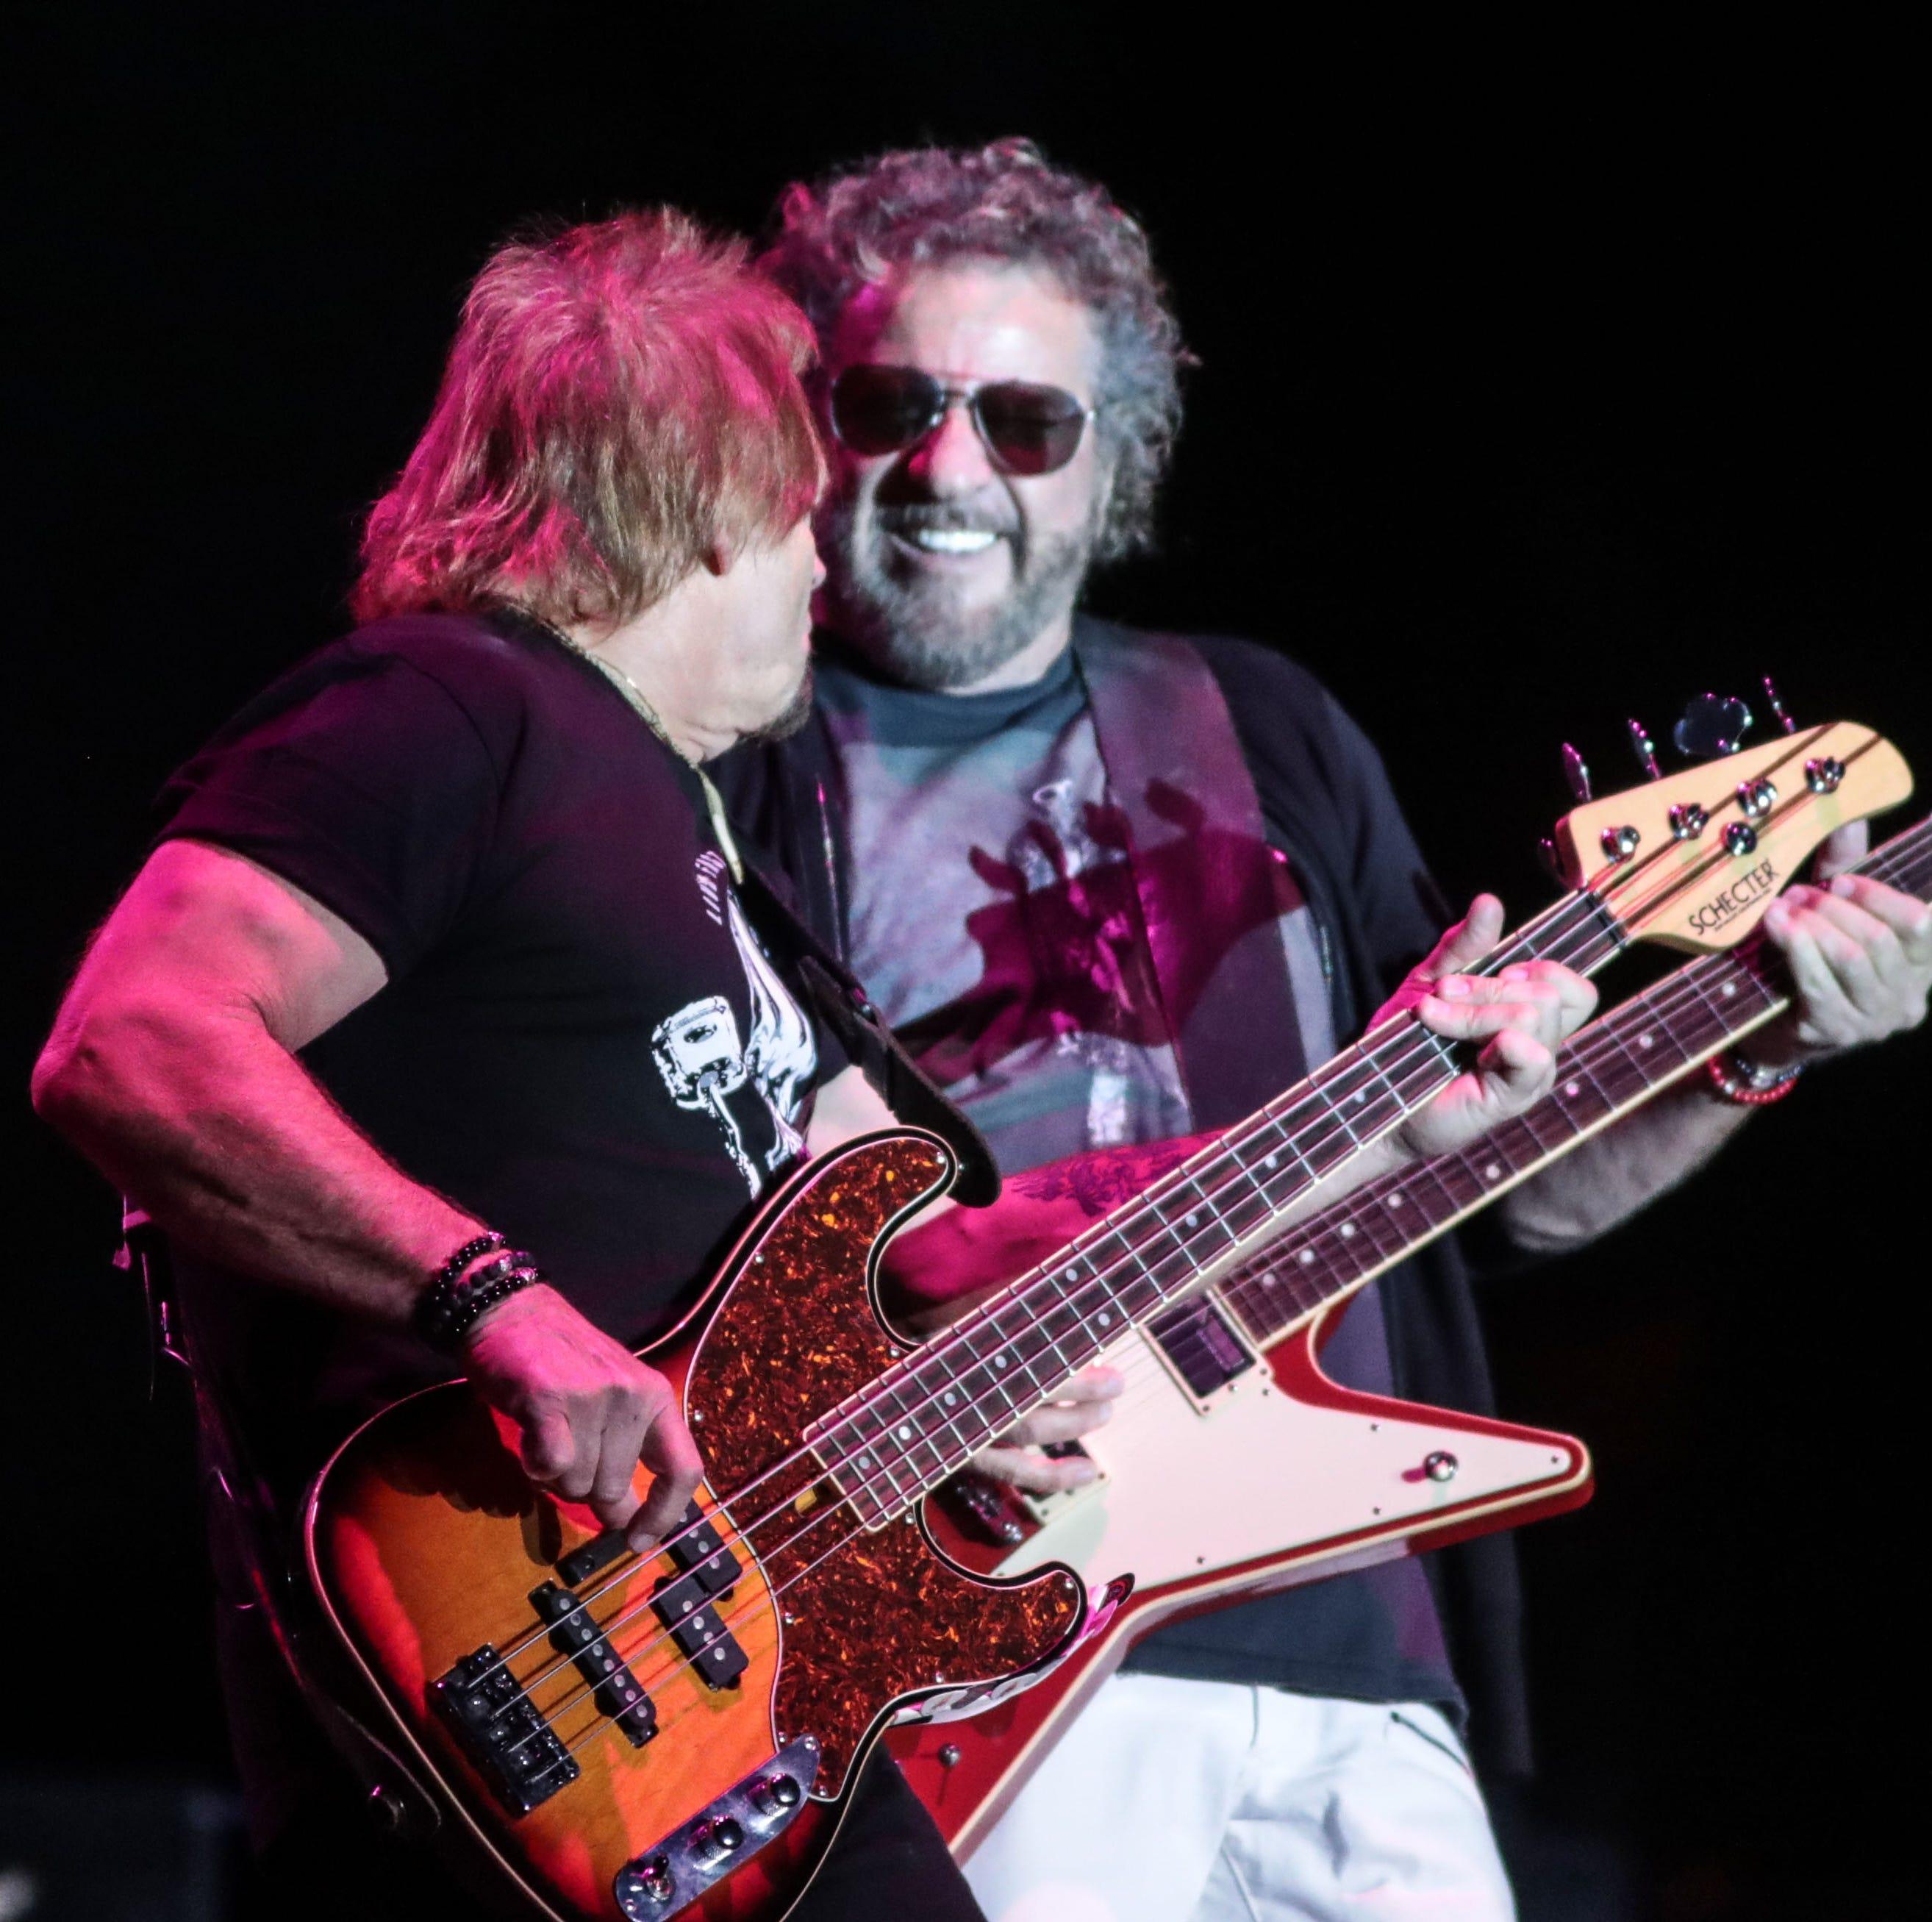 Sammy Hagar comes full circle to prove he's a Desert Classic rocker